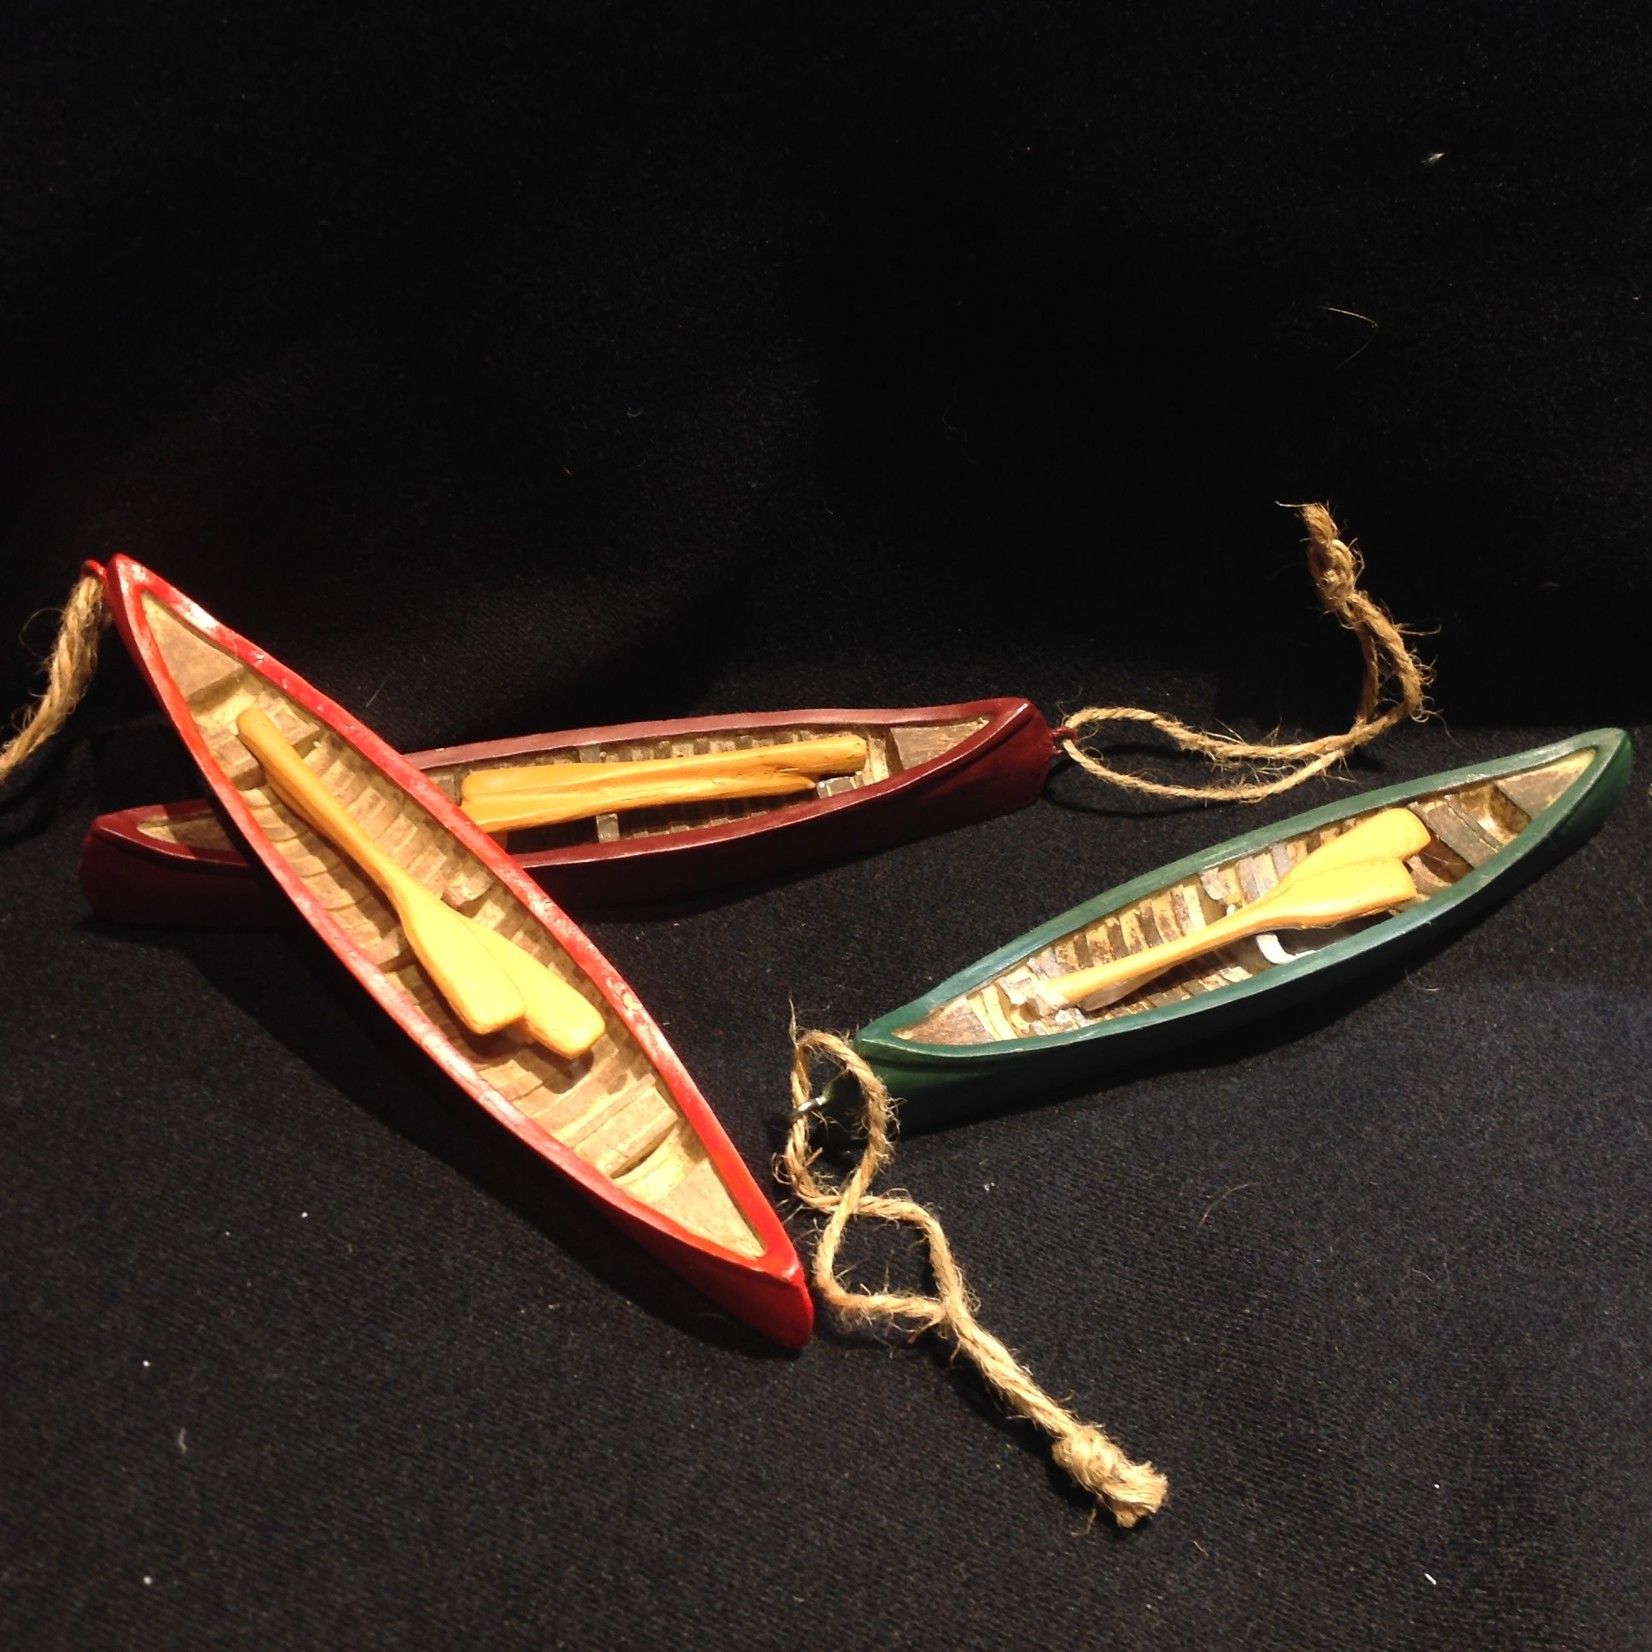 Canoe Ornament w/Paddles 3A